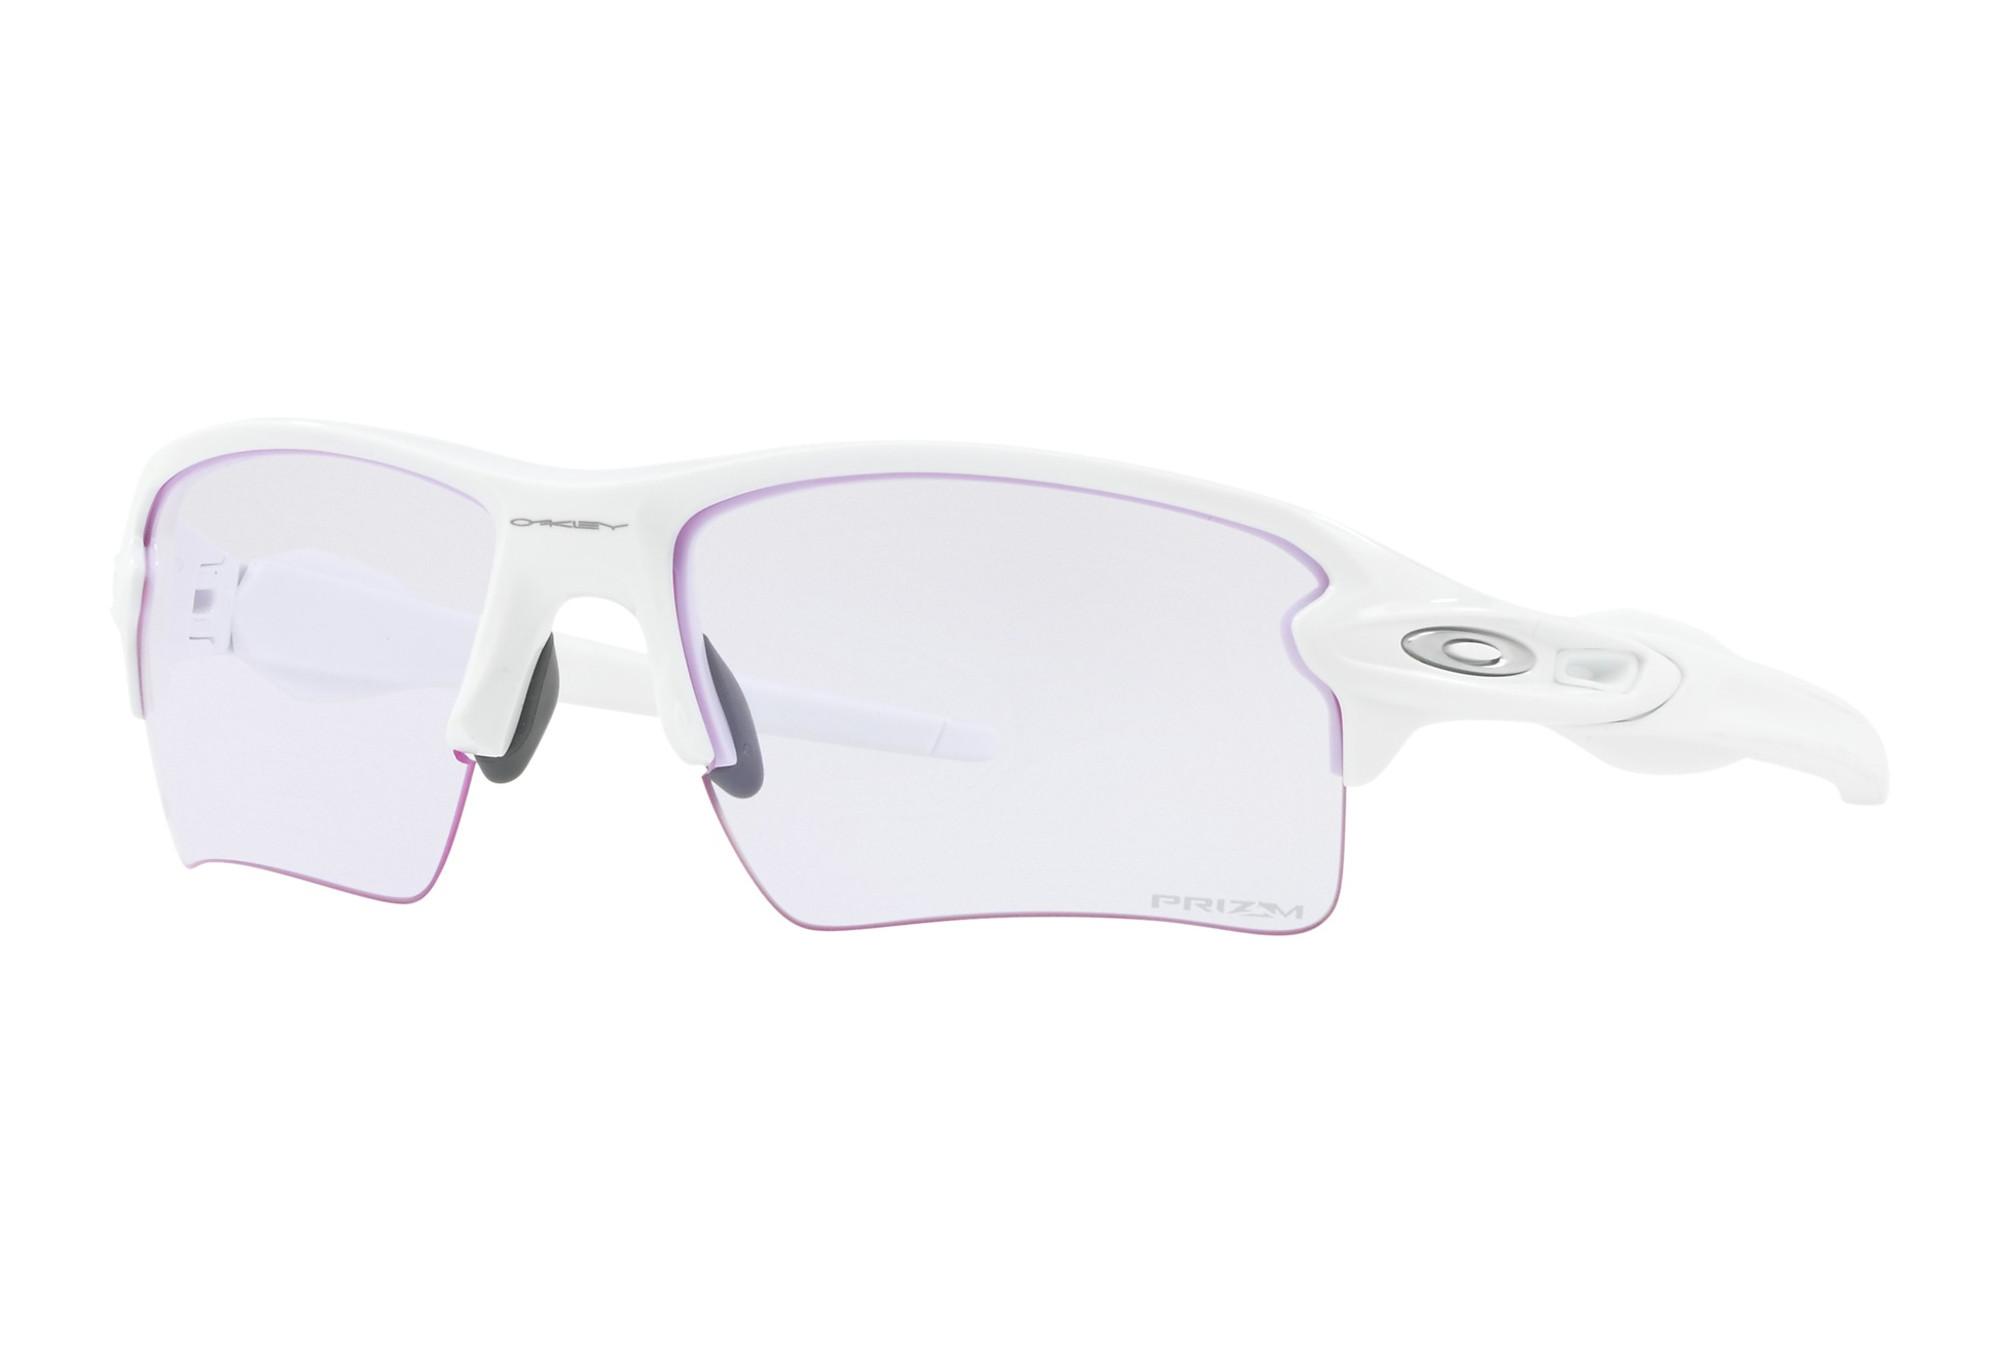 b6046b3064566 Lunettes Oakley Flak 2.0 XL Blanc - Prizm Low Light OO9188-8859 ...